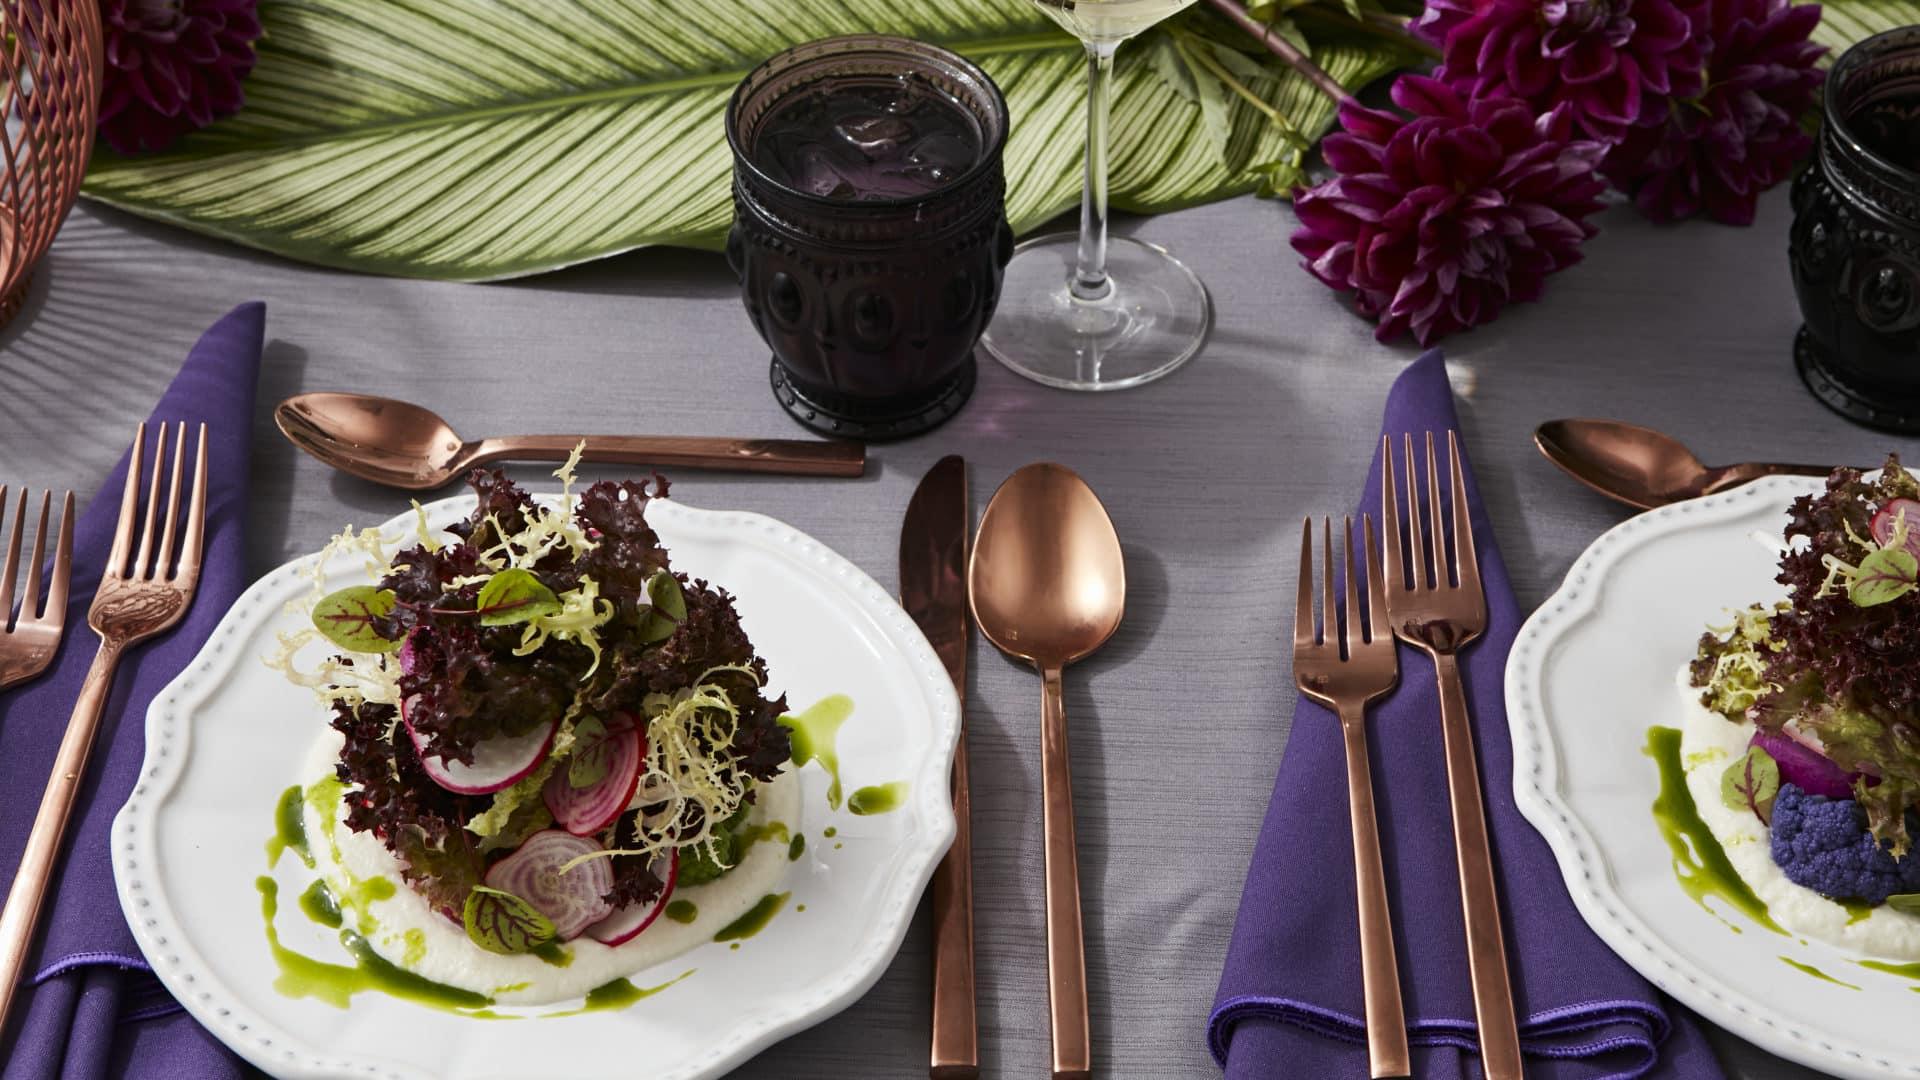 Appetizer, Seasonal Brassicas